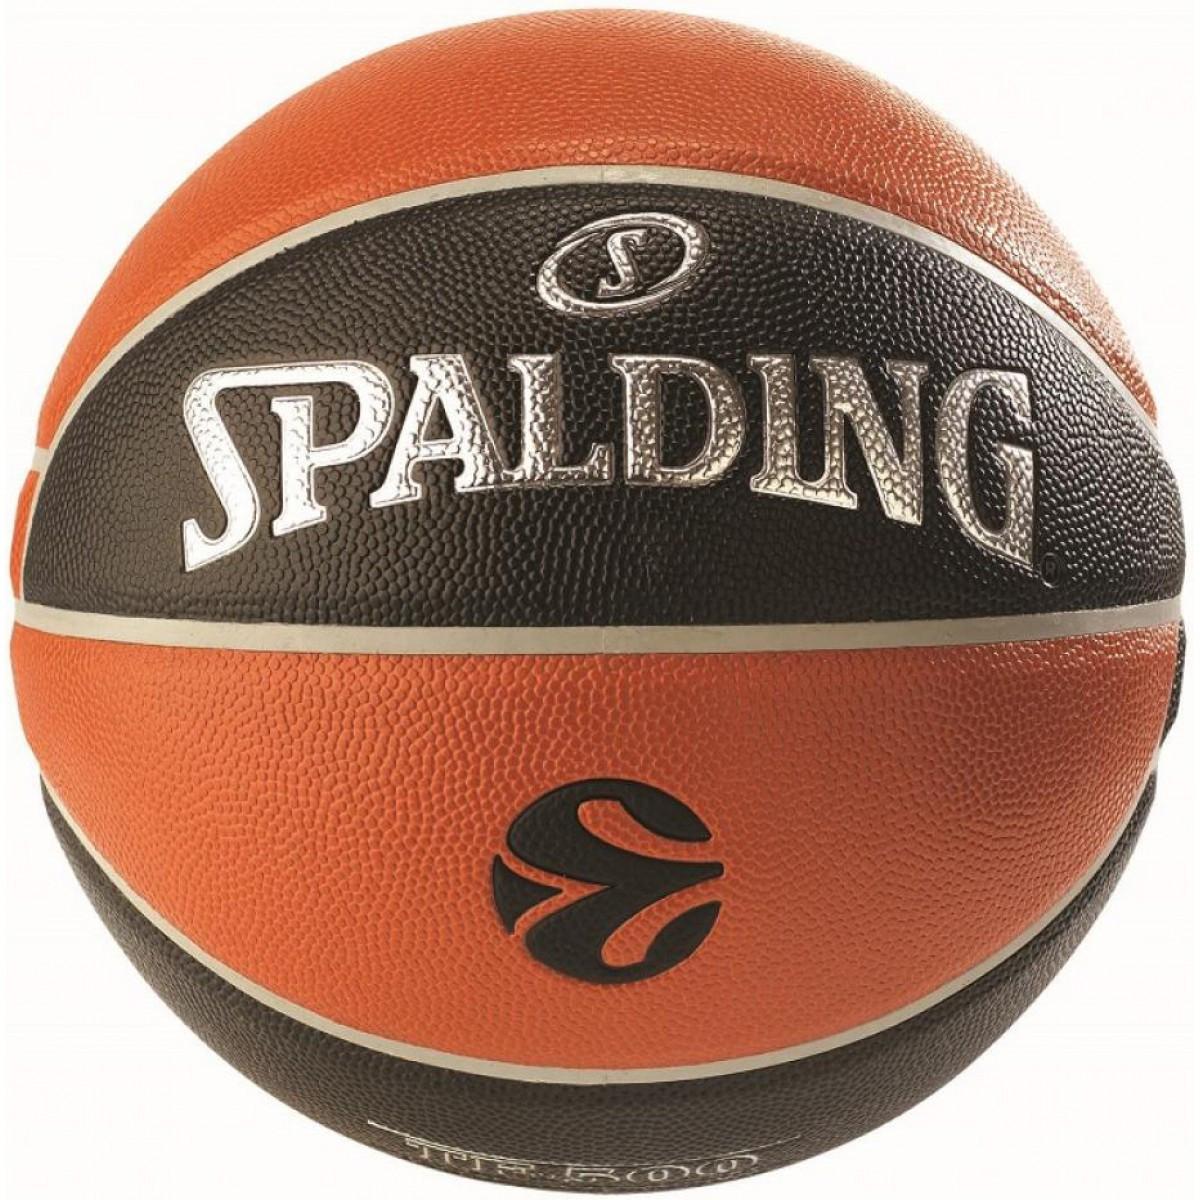 Мяч баскетбольный Spalding Euroleague TF-500 IN/OUT размер 7